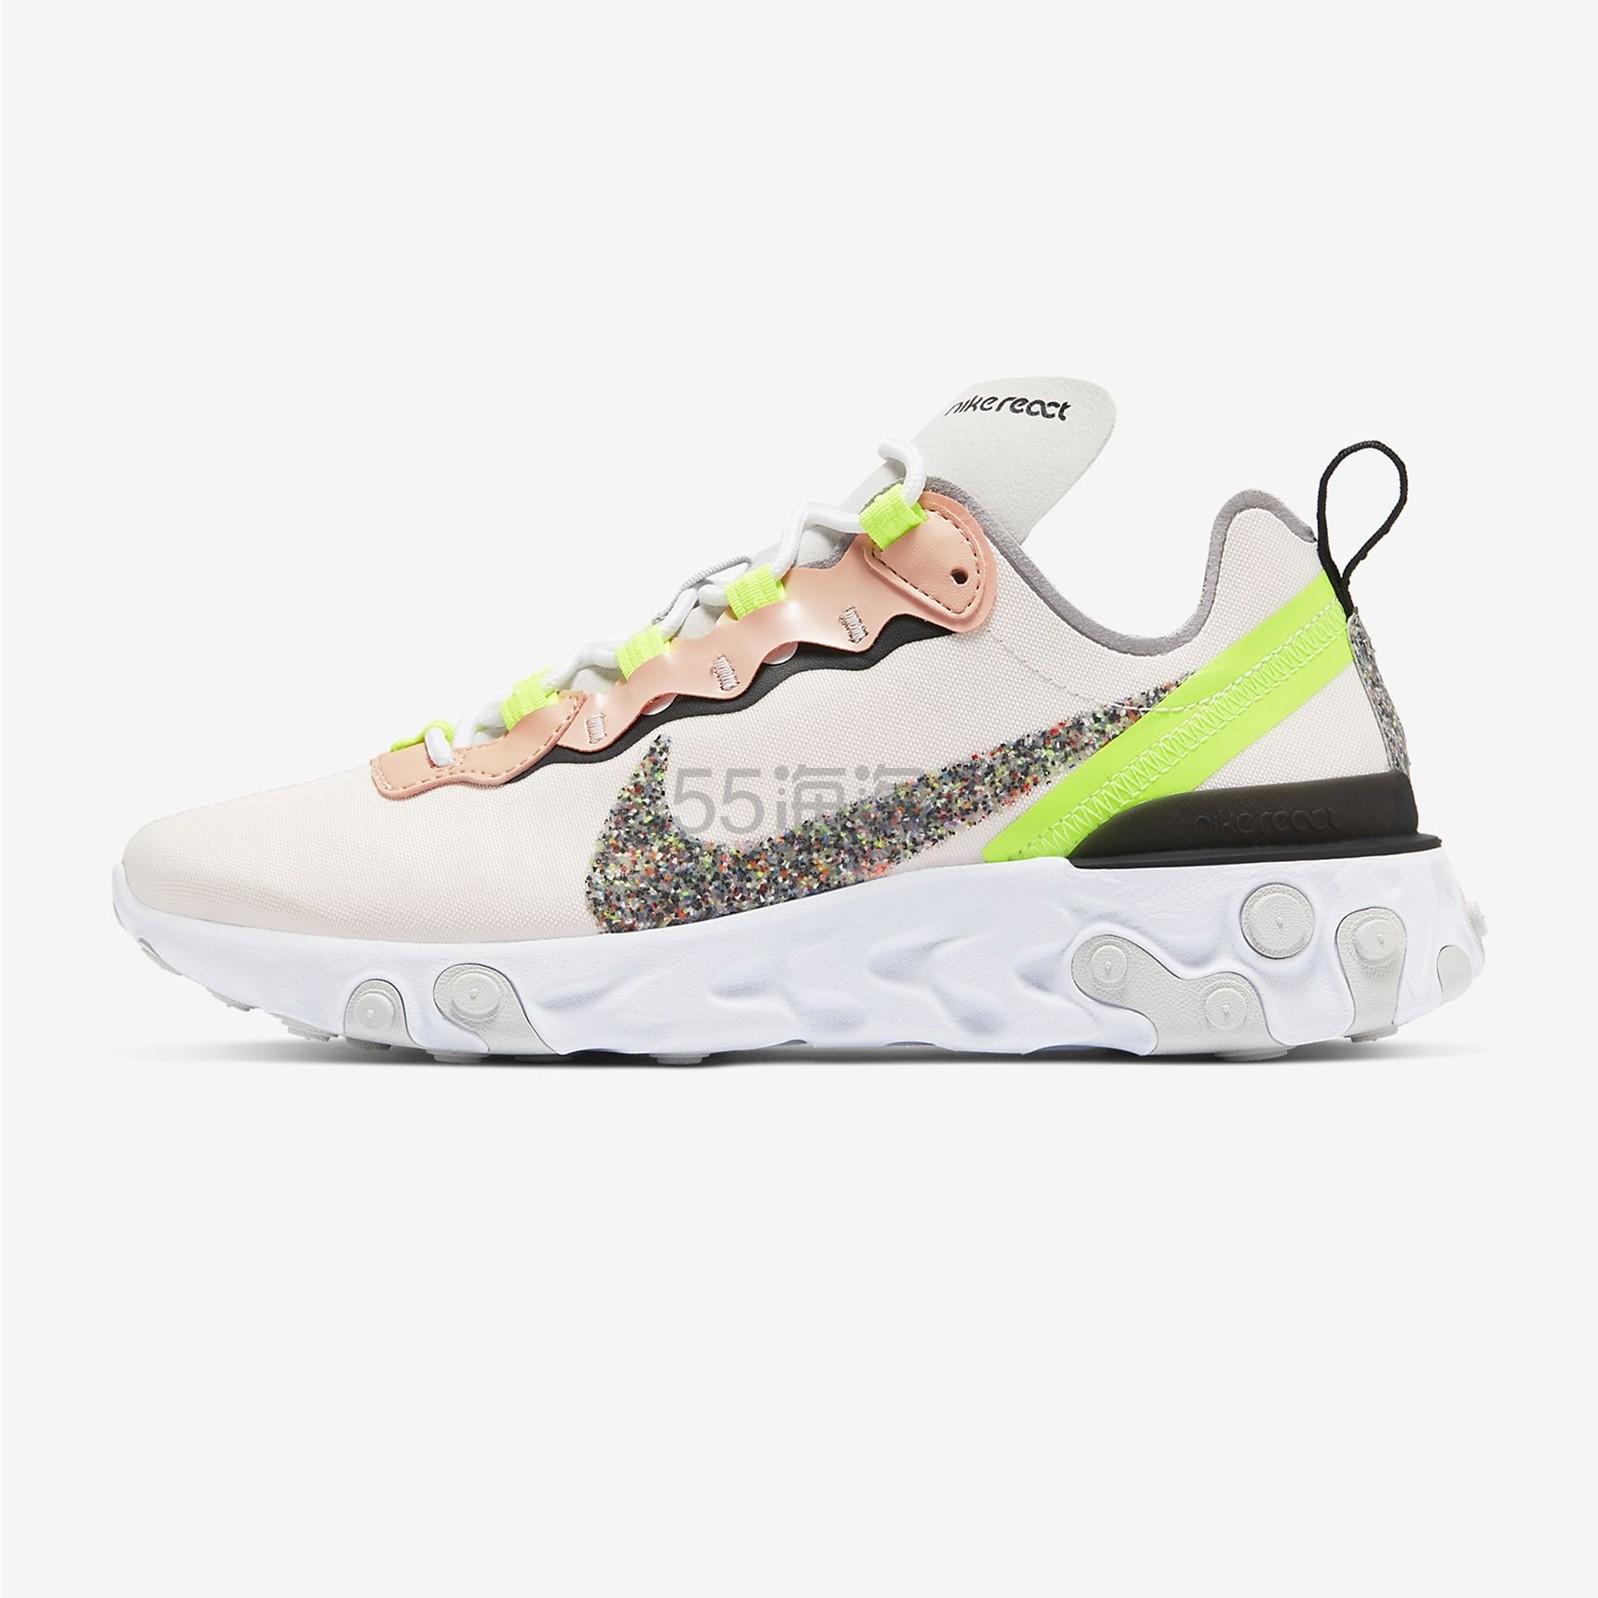 Nike 耐克 React Element 55 PRM 女子运动鞋 ¥479 - 海淘优惠海淘折扣|55海淘网